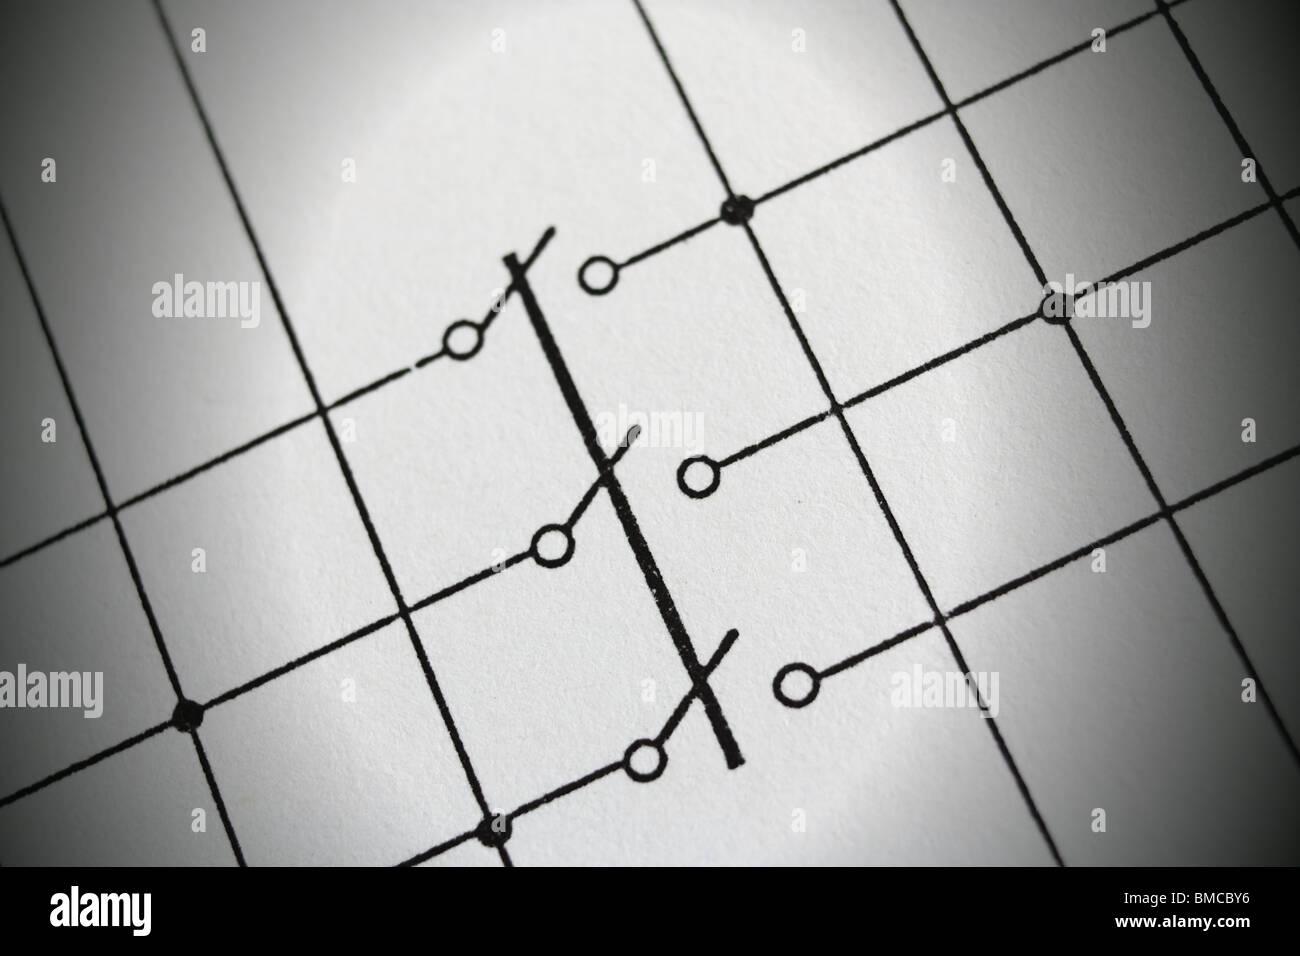 A high voltage disconnector schematics symbol. - Stock Image